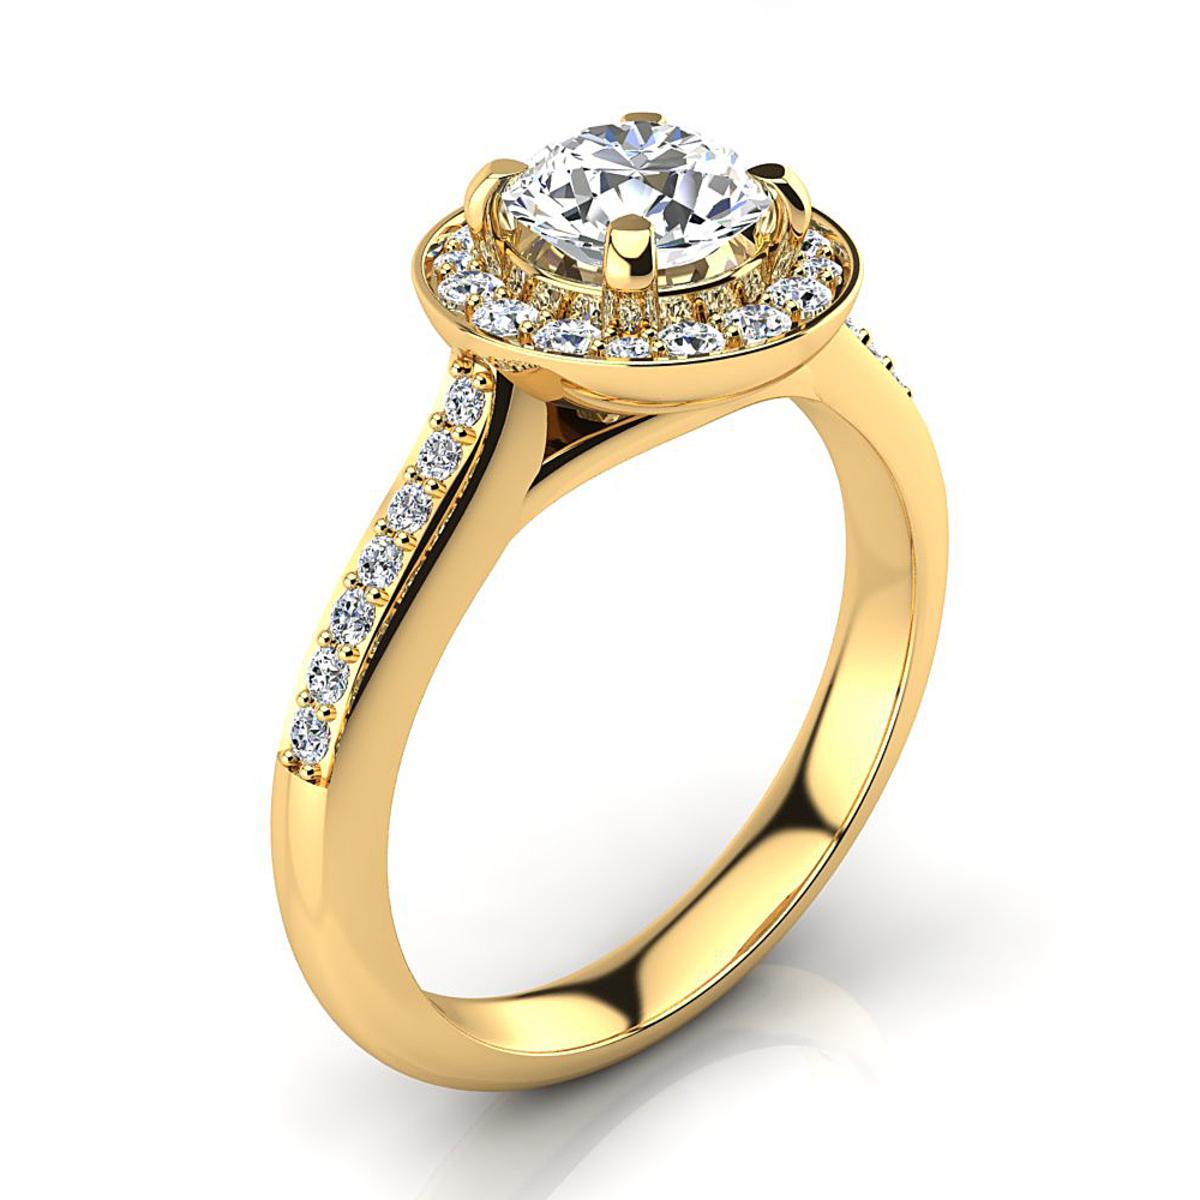 Halo Designer 18K Gold G/VS Round Diamond Engagement Ring 1.1ct by Luxurman